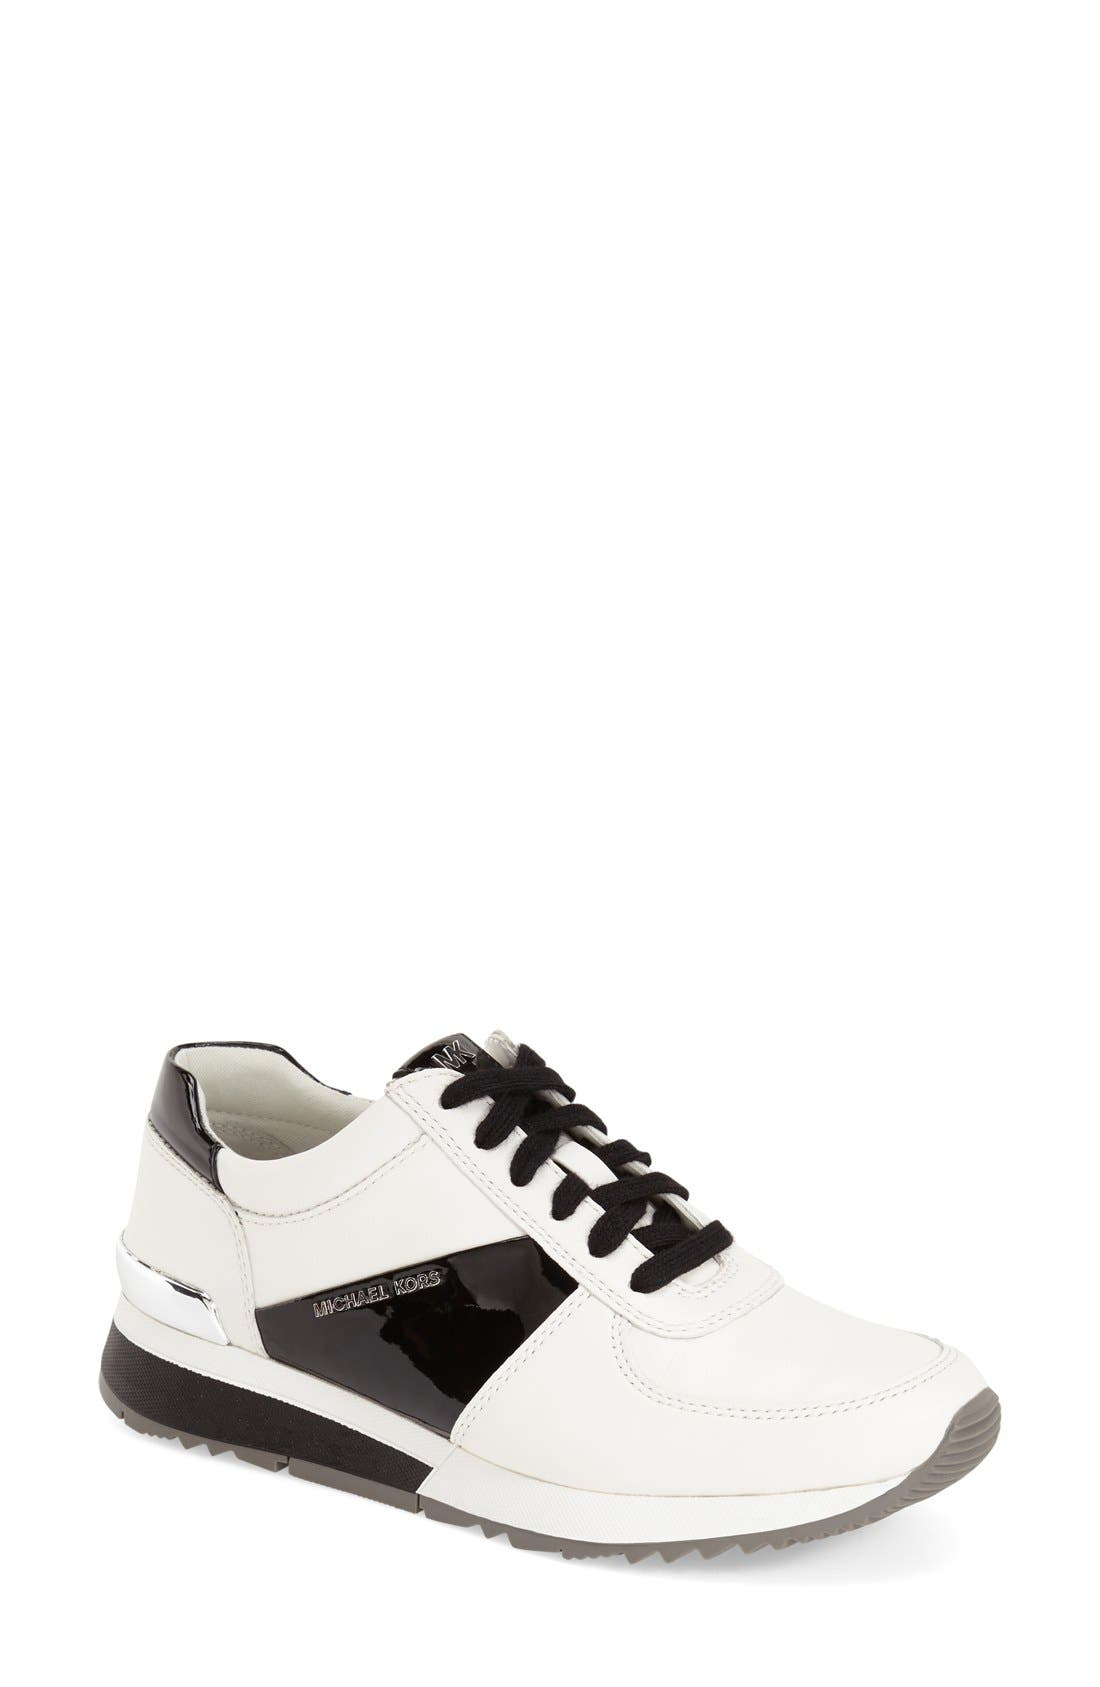 Main Image - MICHAEL Michael Kors 'Allie' Sneaker (Women)